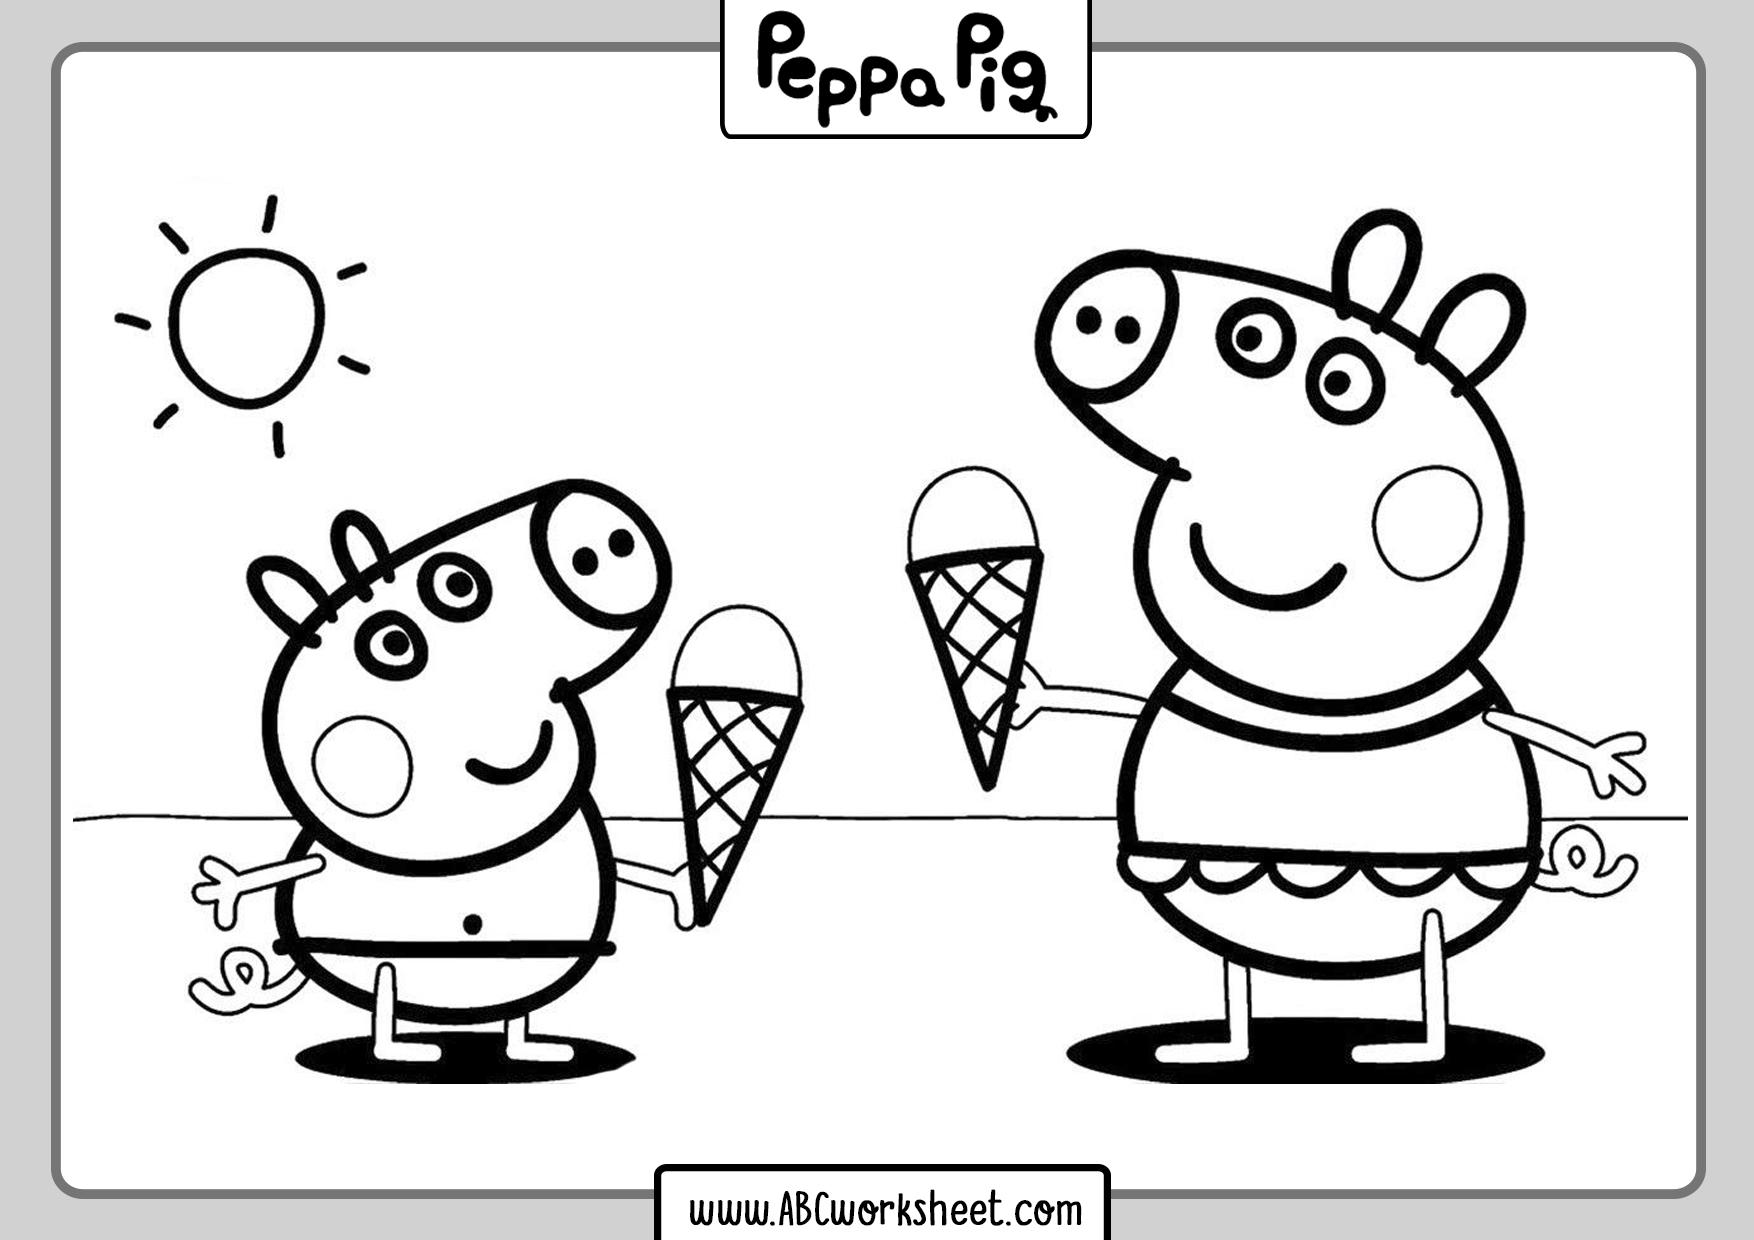 Peppa Pig Drawings For Coloring